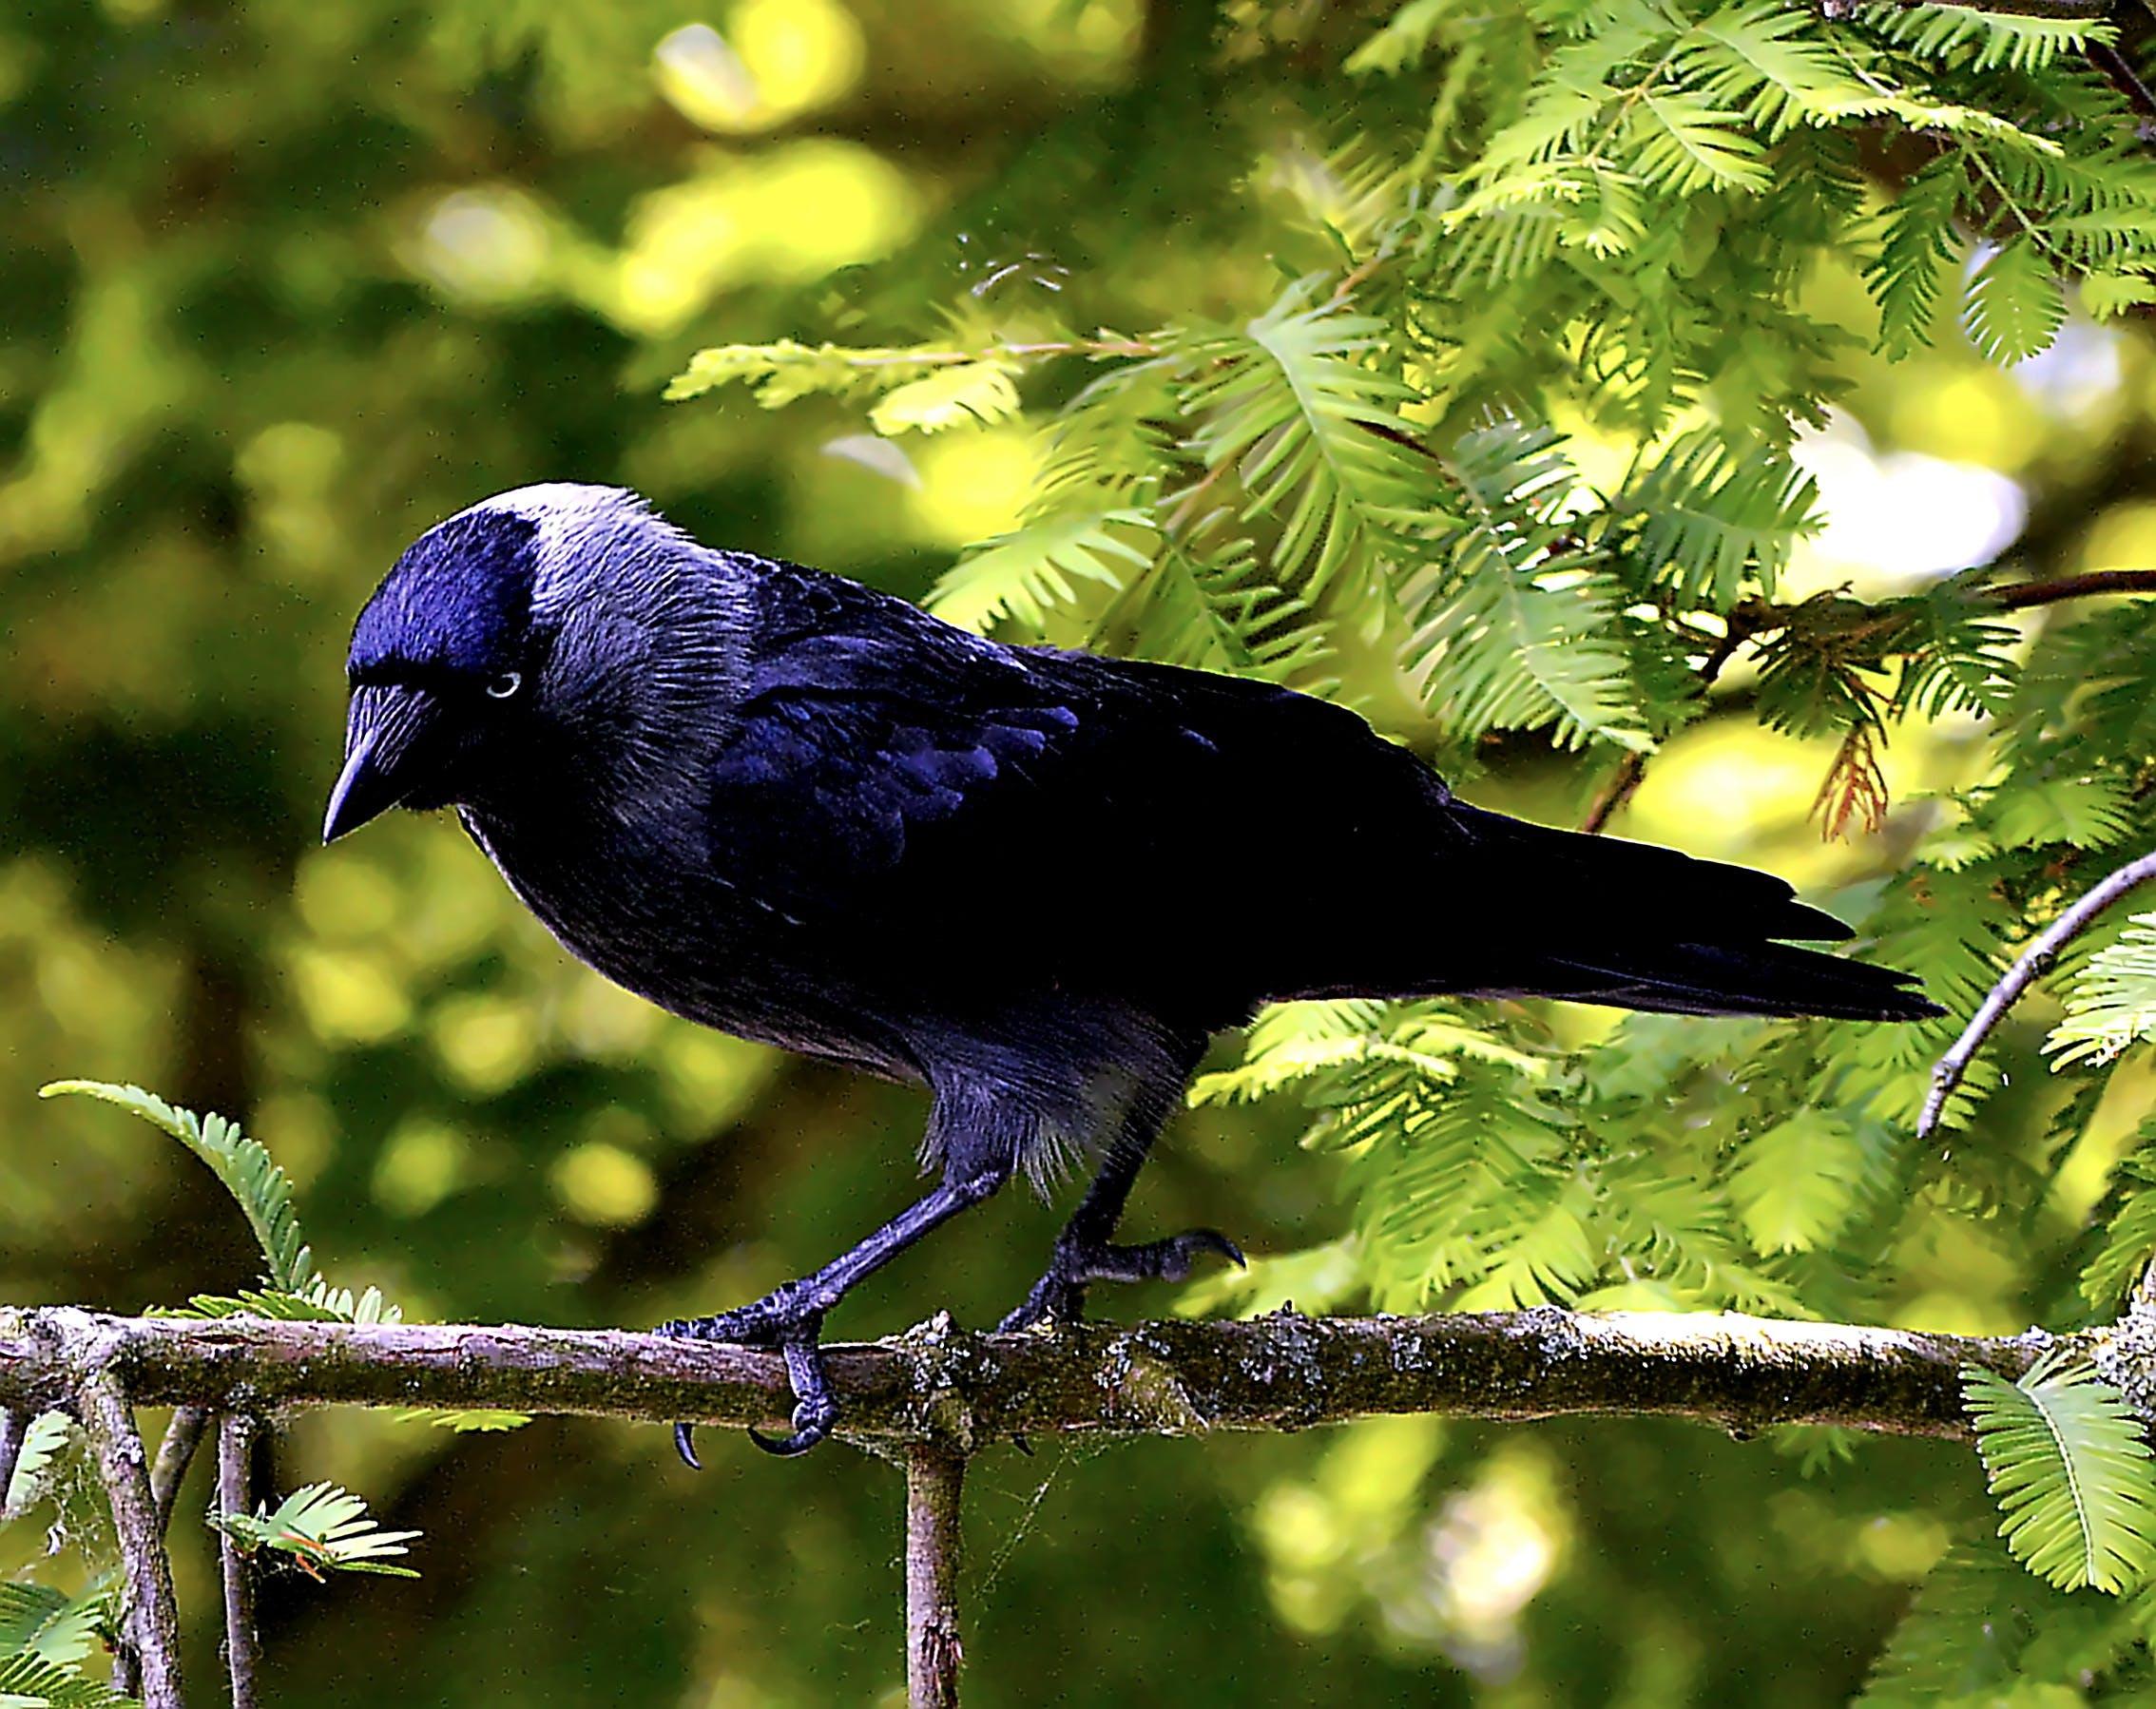 Free stock photo of nature, bird, animal, eyes